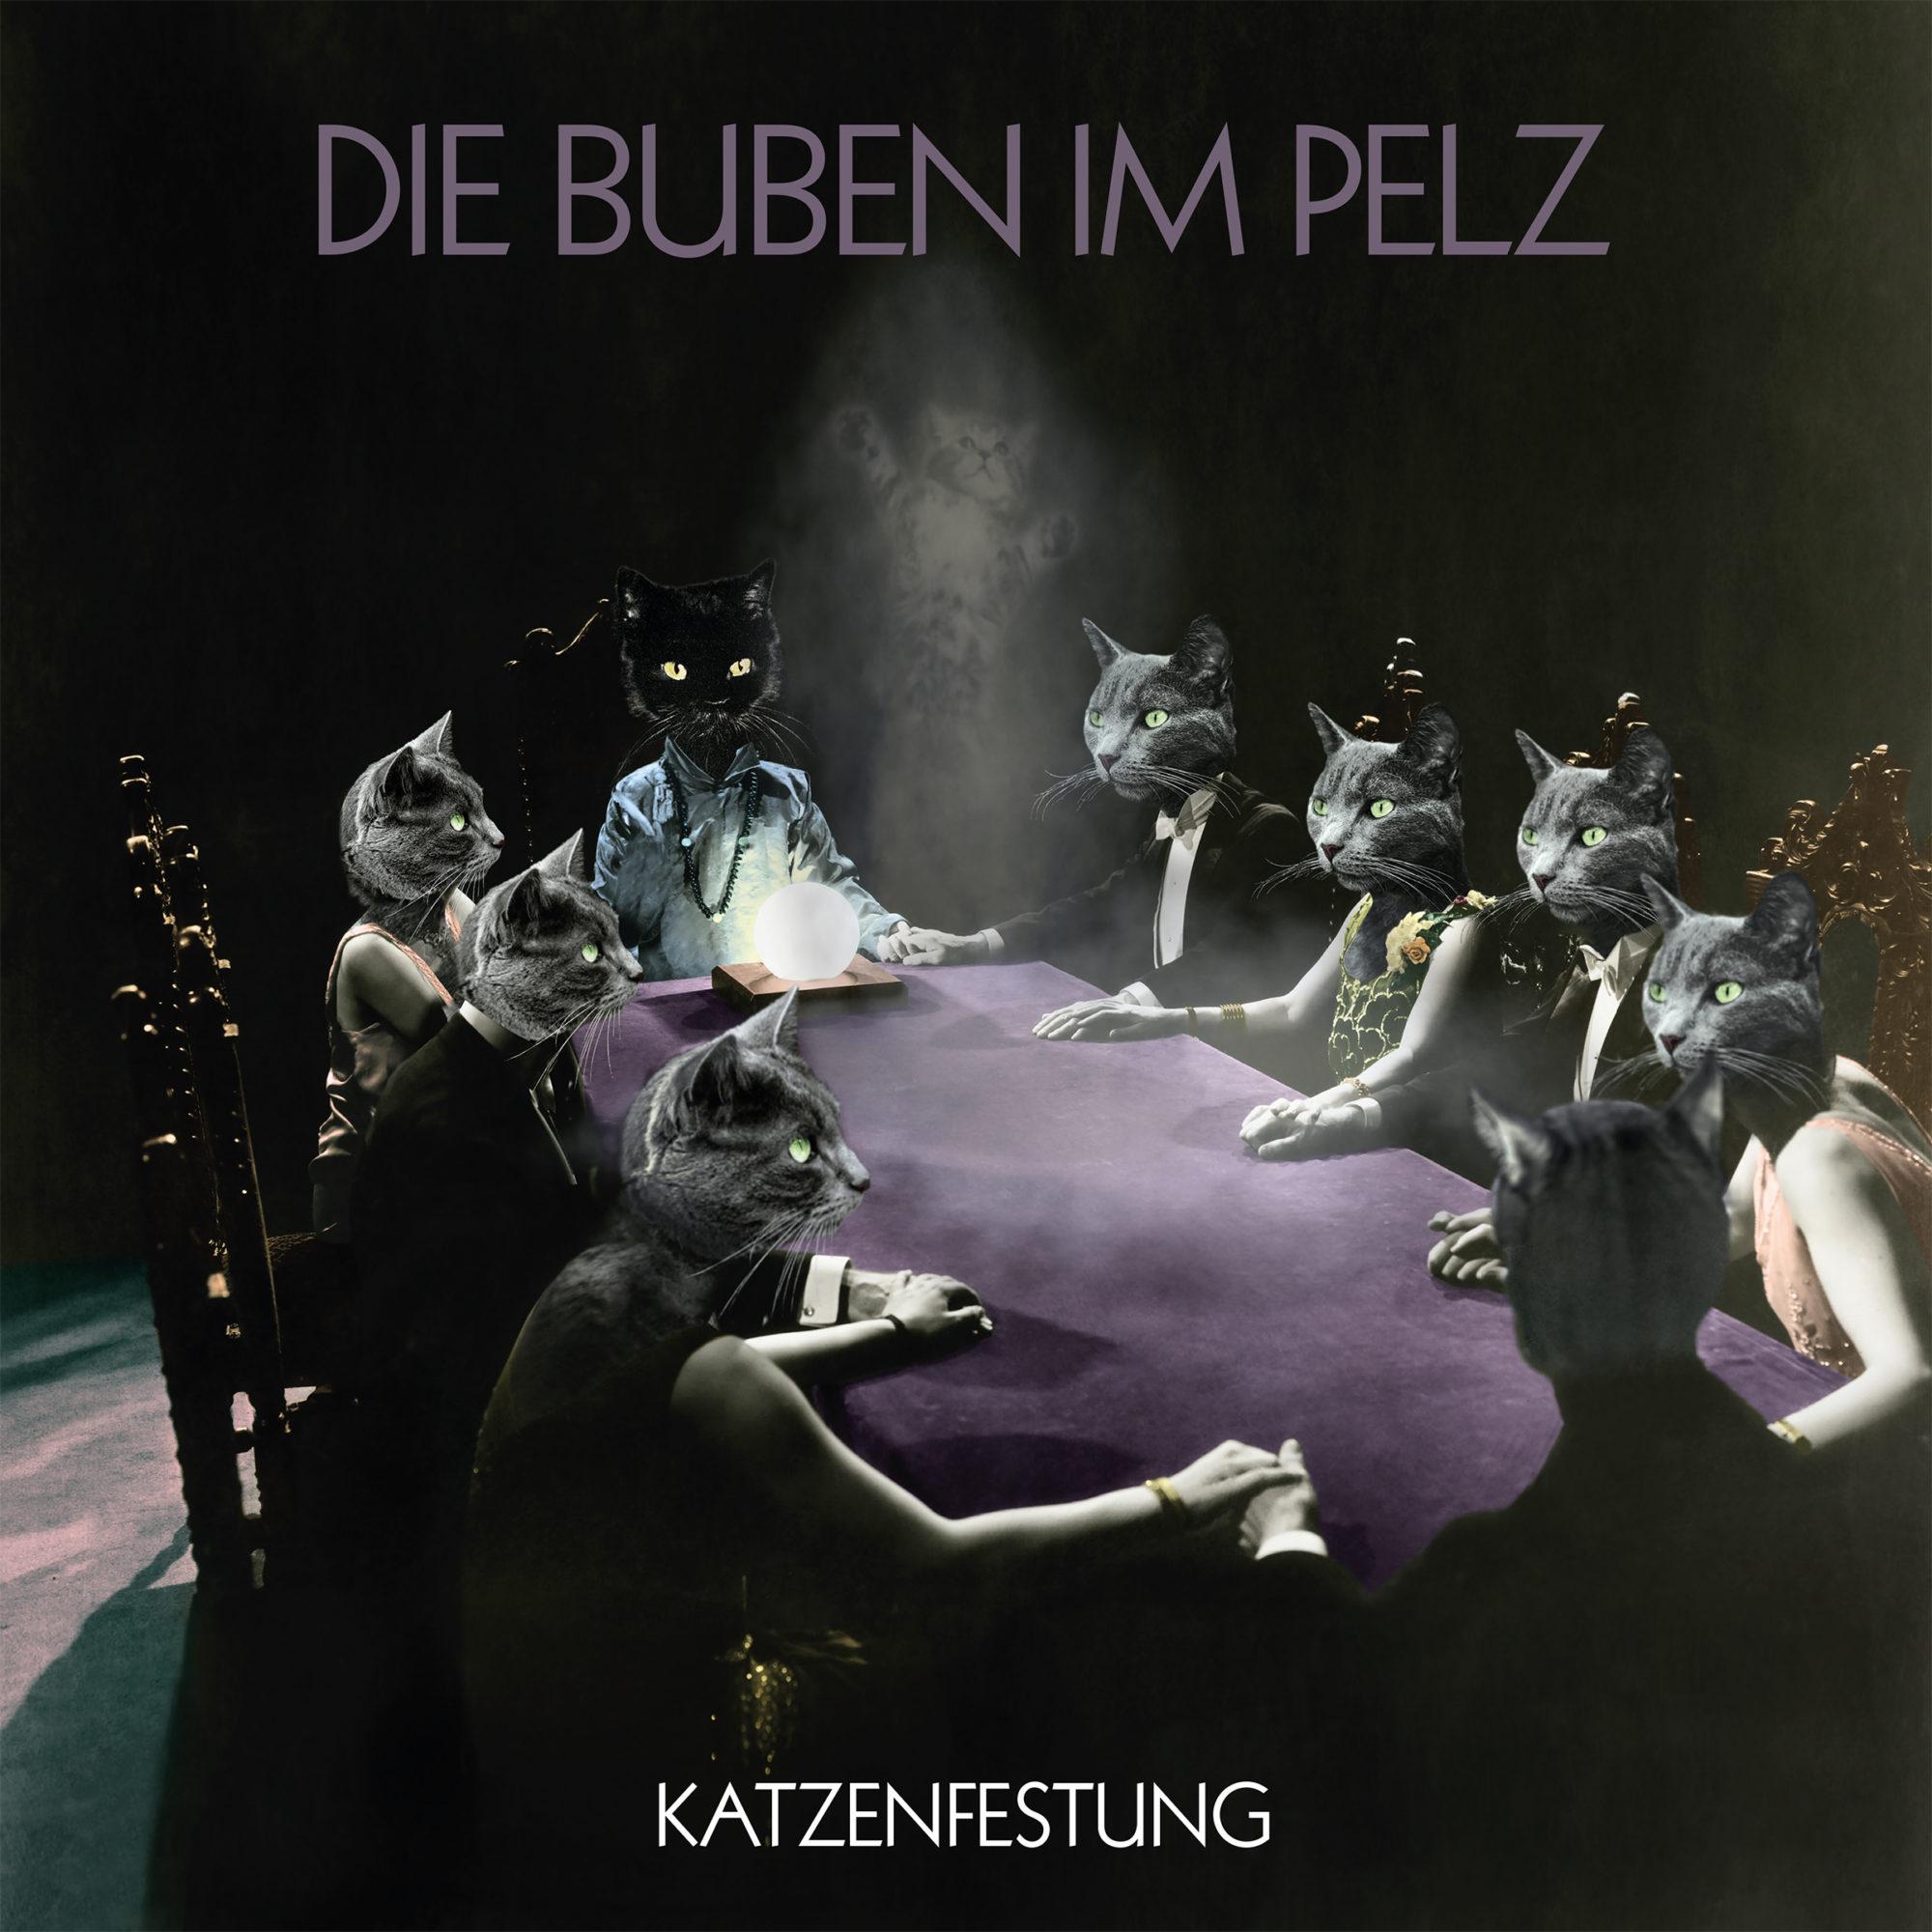 Die Buben im Pelz Band Katzenfestung Album Vinyl Cover Artwork Wien Berlin